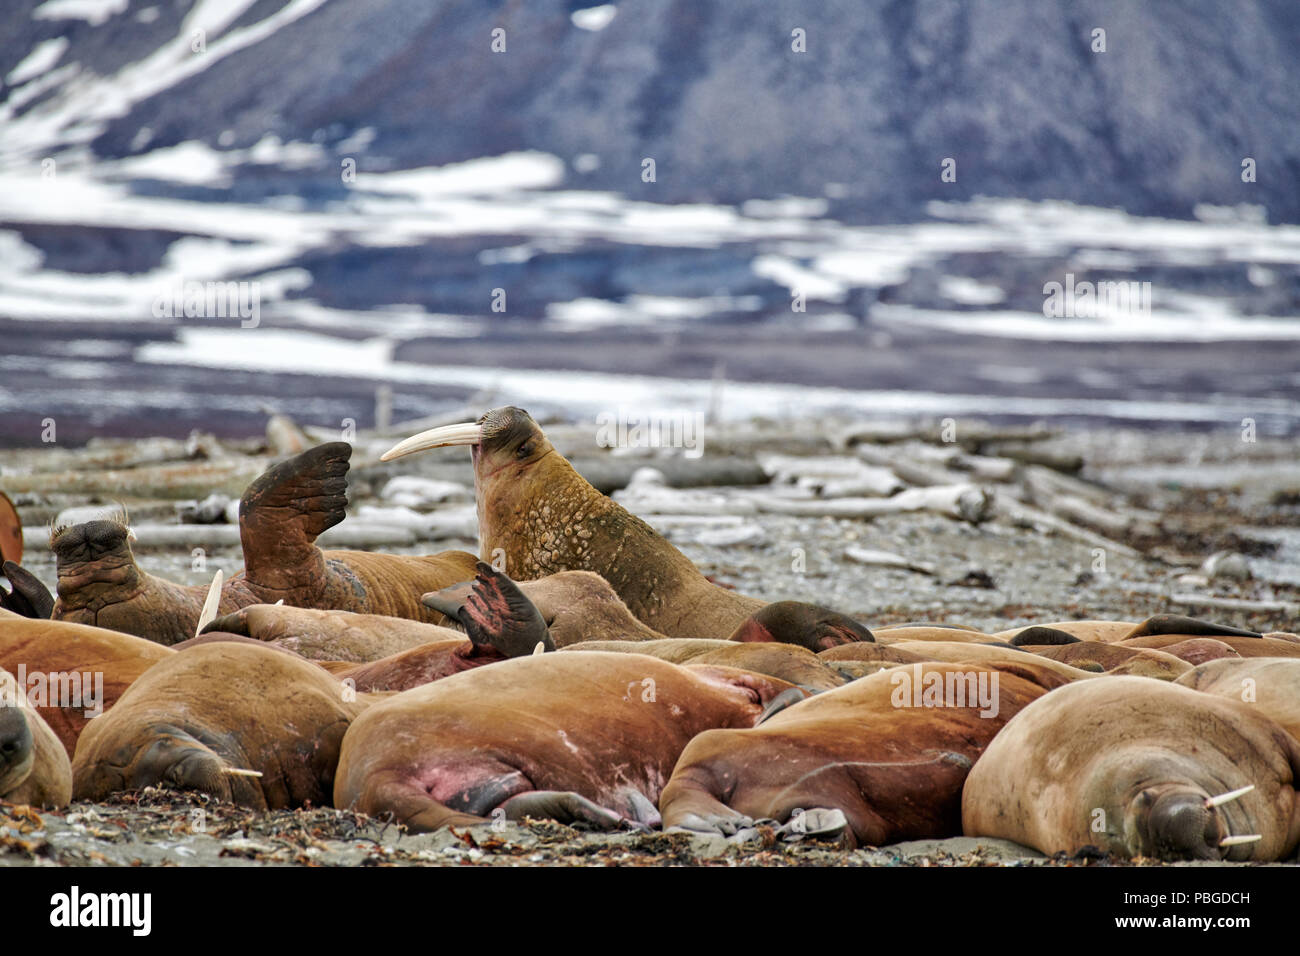 Tricheco, Odobenus rosmarus, Poolepynten, Svalbard o Spitsbergen, Europa Immagini Stock